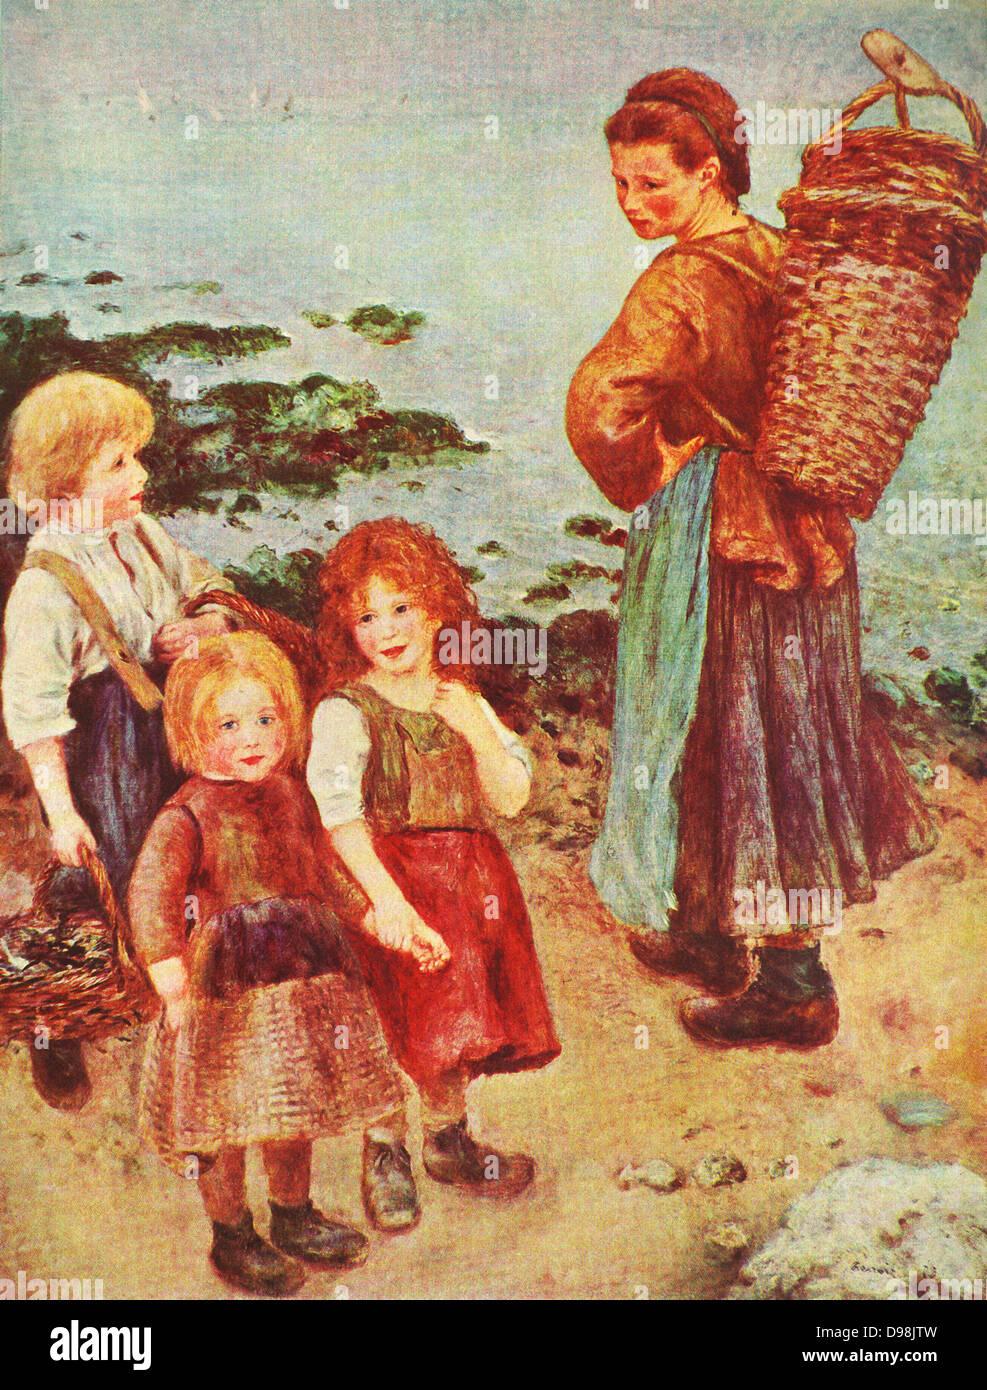 Perre Auguste Renoir: The mussel fishers at berneval 1879 - Stock Image